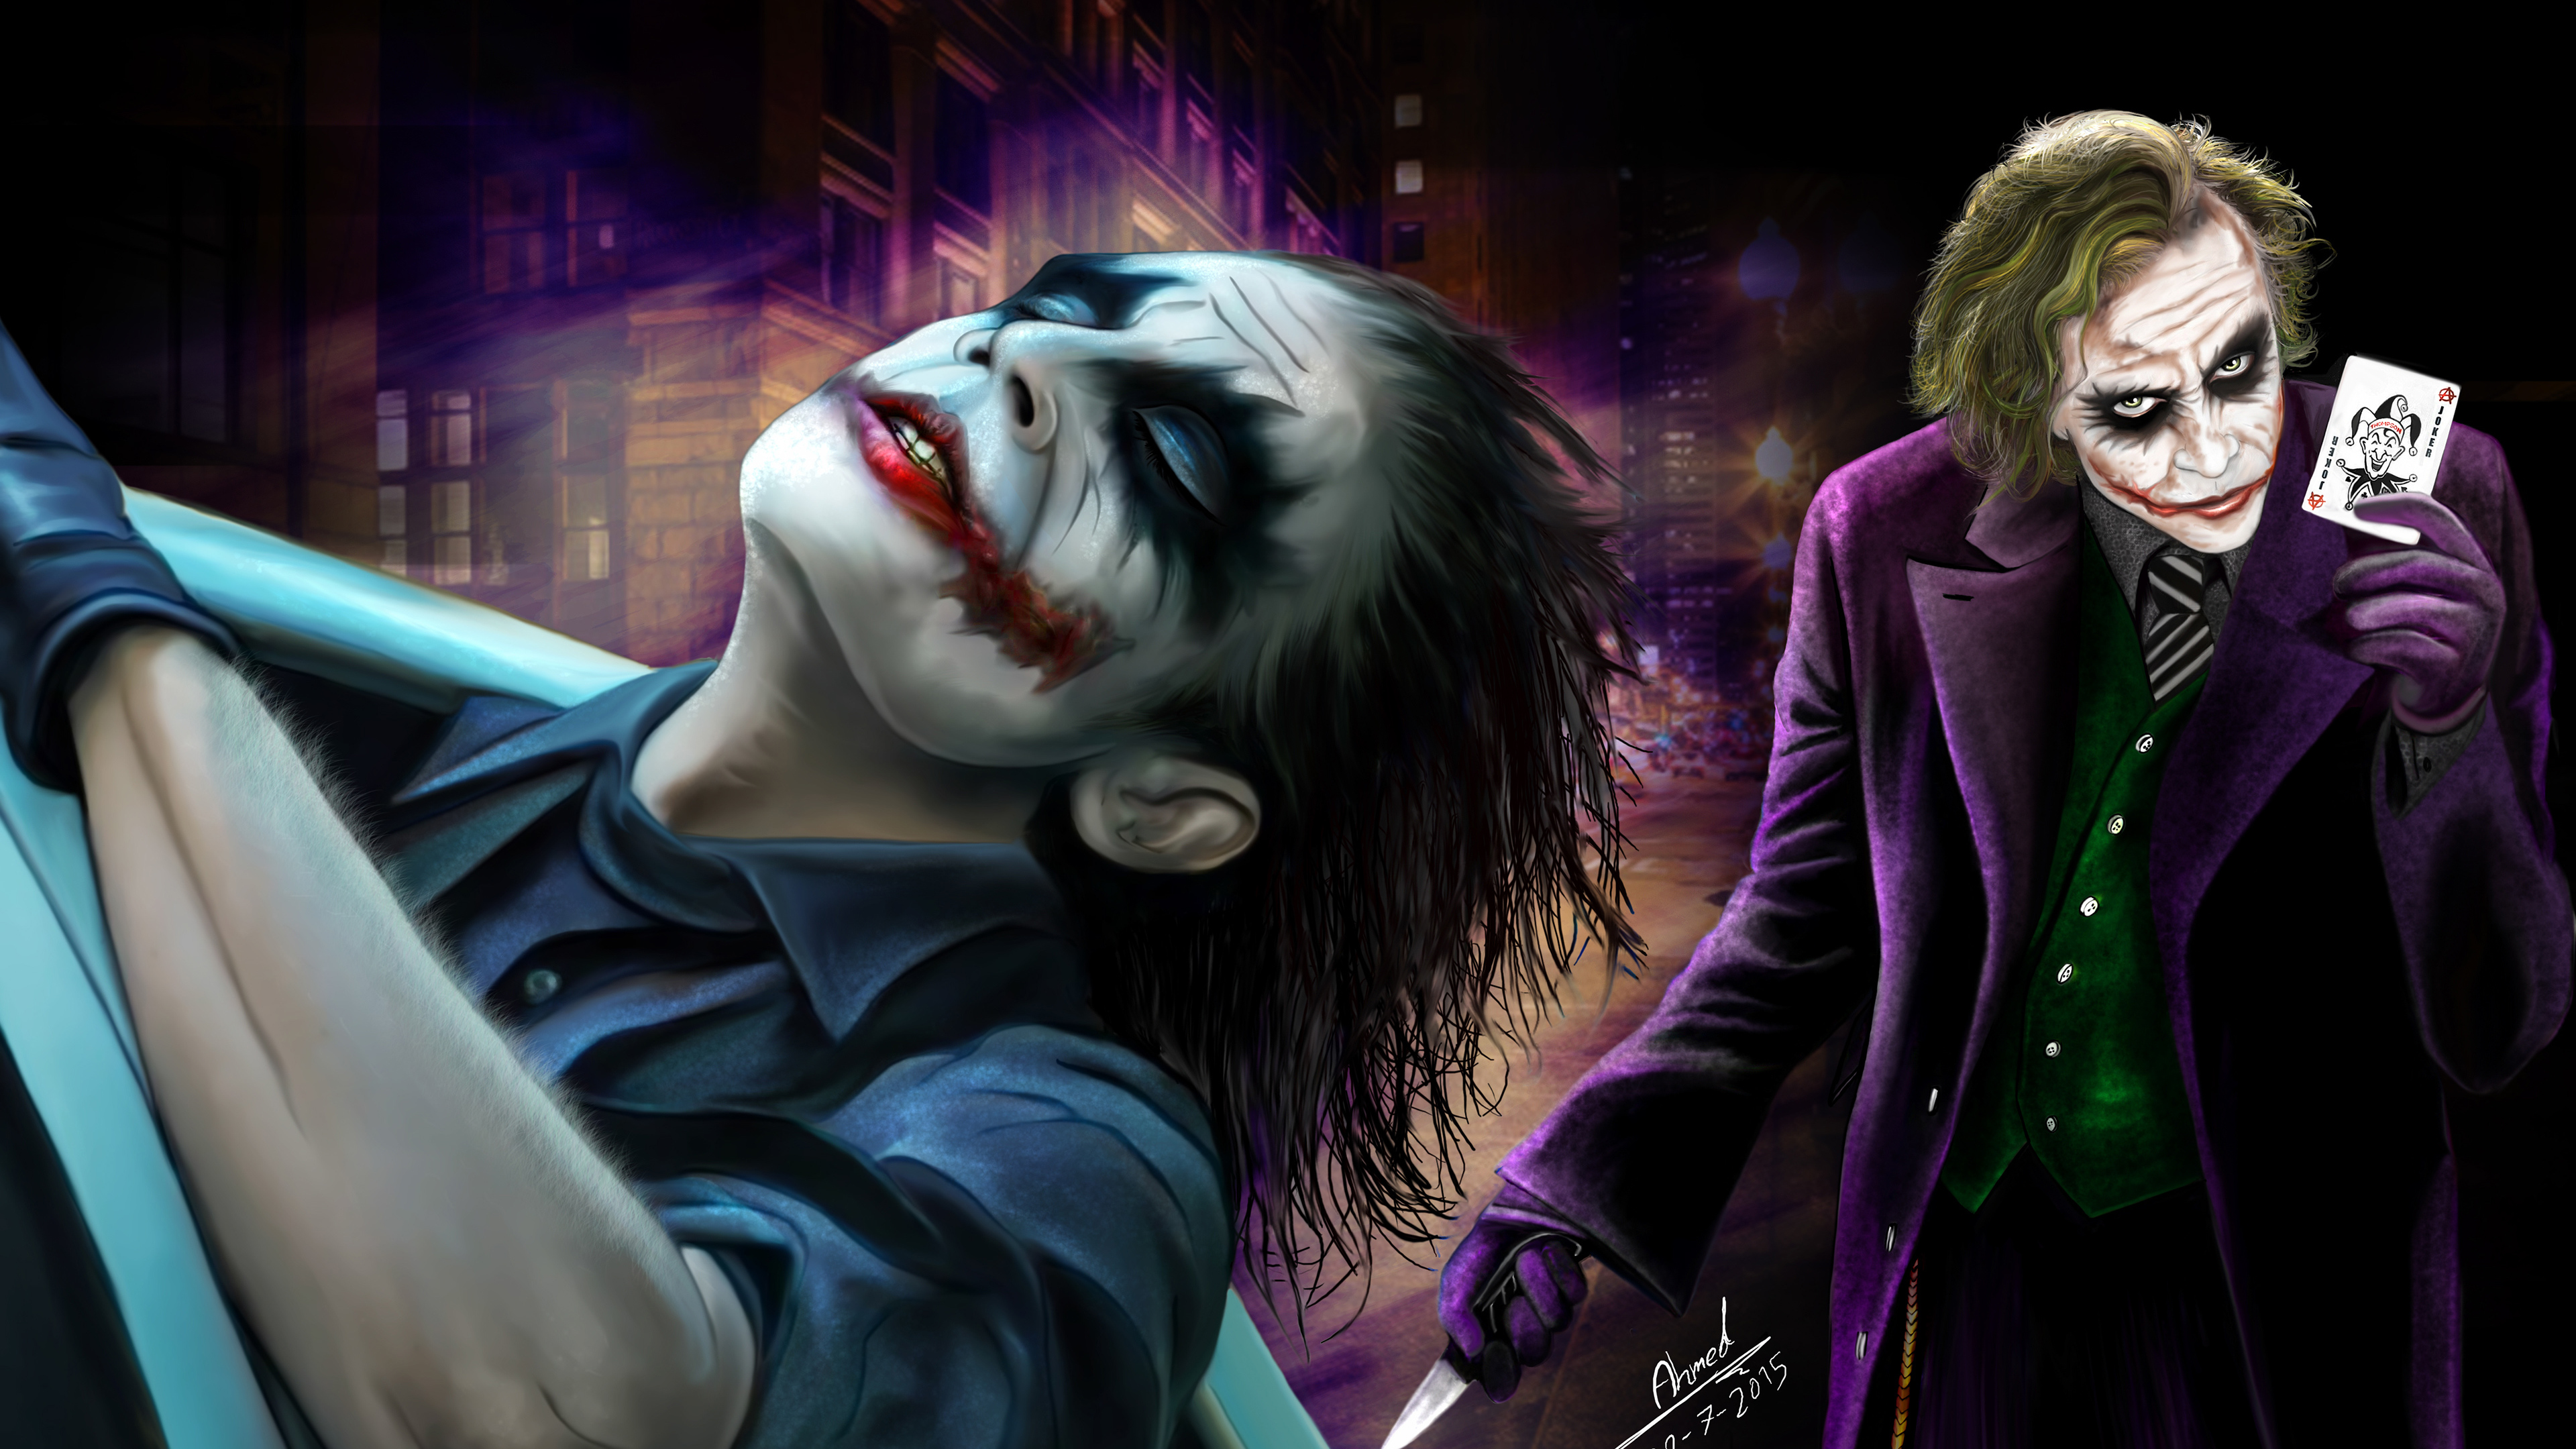 Wallpaper 4k 4k Joker 2019 4k Wallpapers Artwork Wallpapers